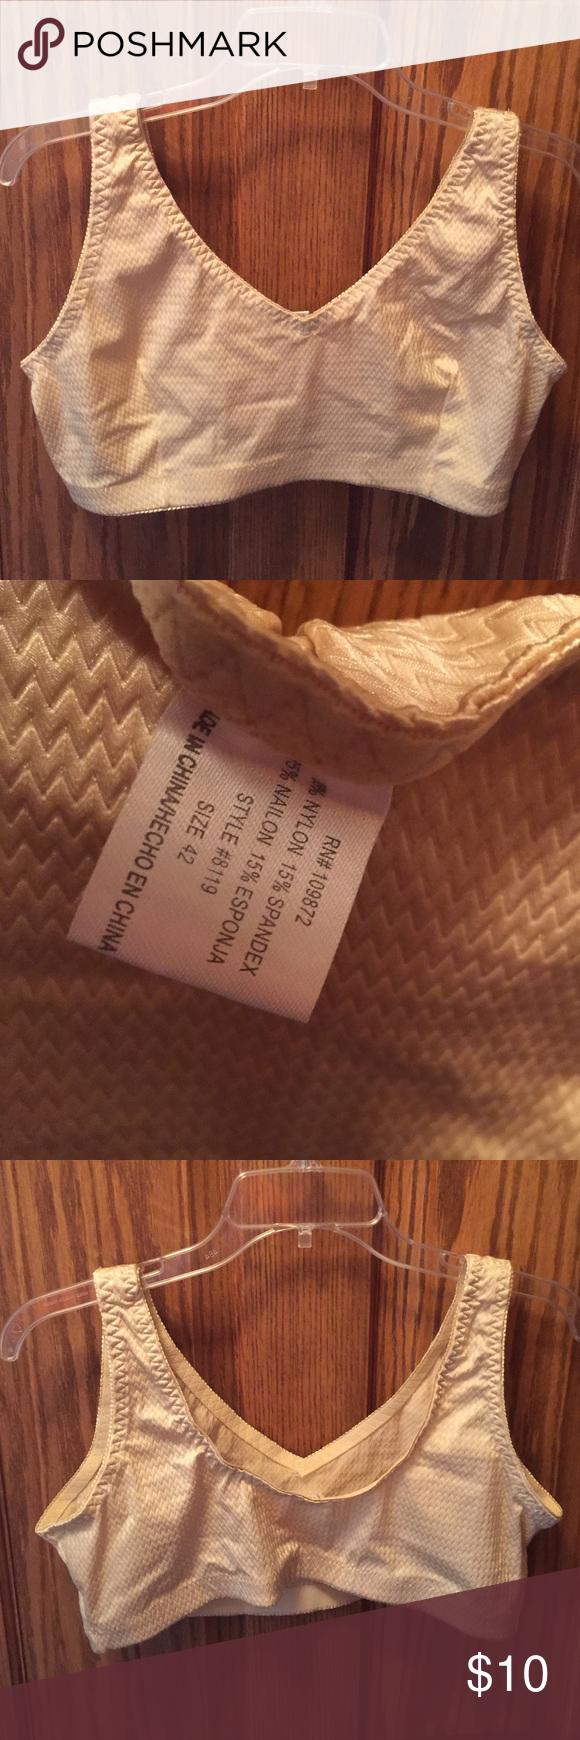 Nude Bra Women's nude bra, size 42, no padding, EUC. See photos. Thank you for looking! Intimates & Sleepwear Bras